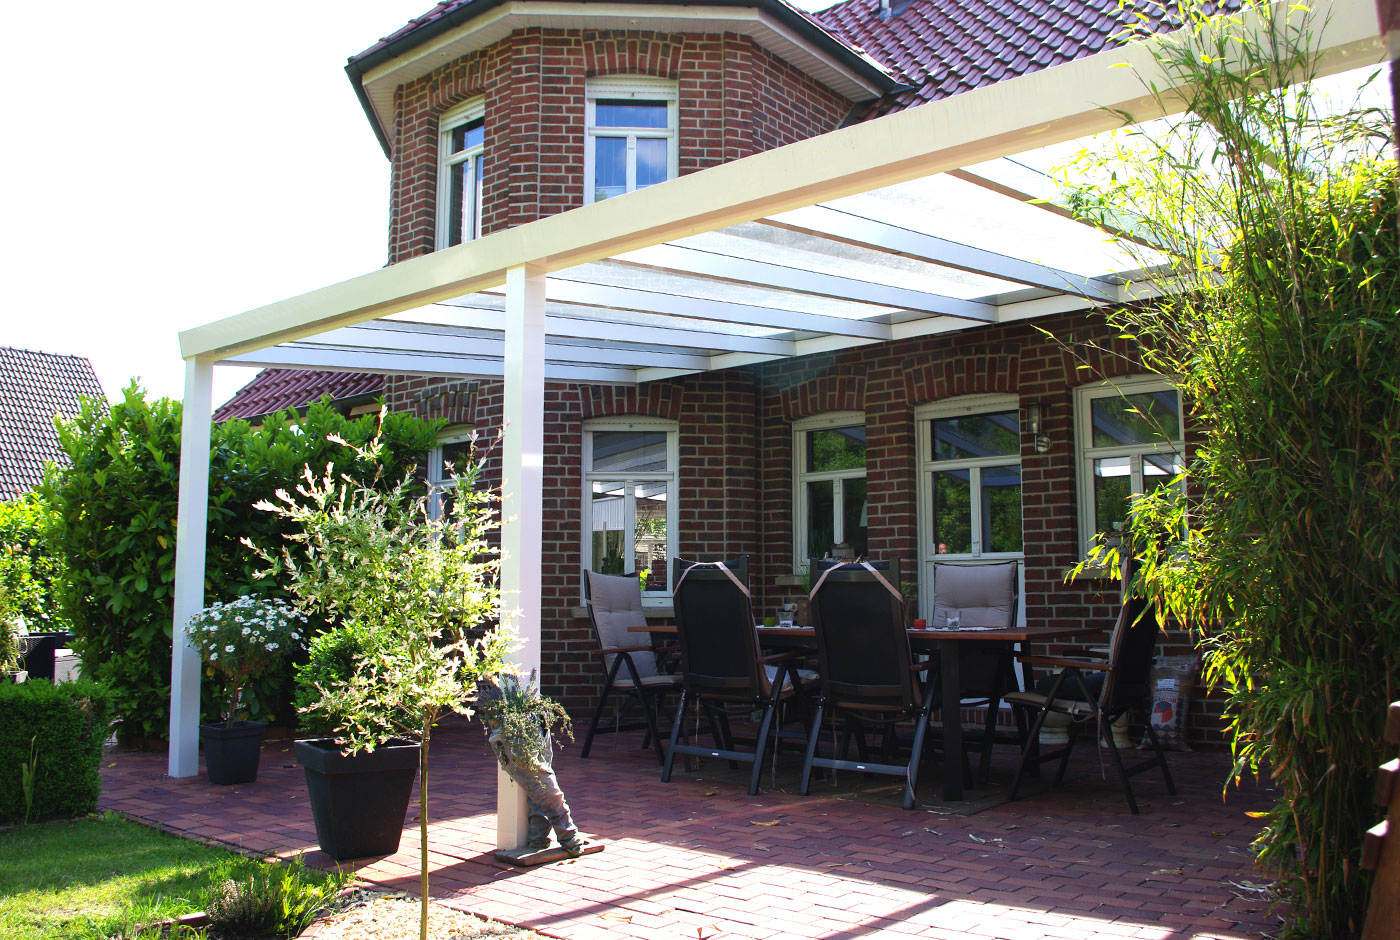 Glas Fur Terrassenuberdachung ~ Verbundsicherheitsglas vsg für glas terrassenüberdachung